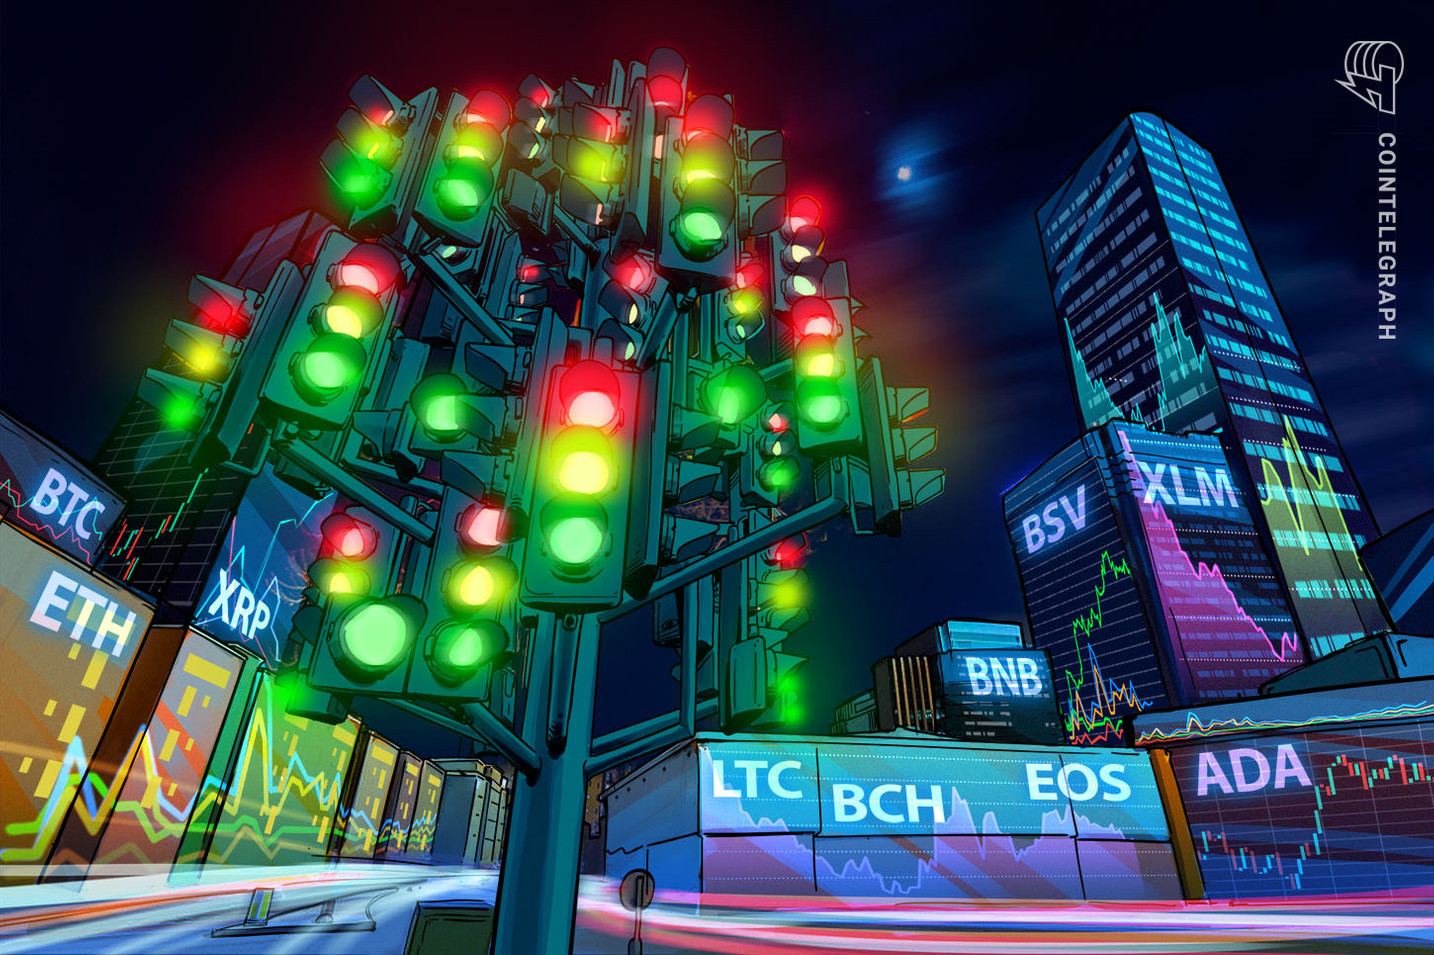 Precio de bitcoin hoy 30/07: Análisis de precios de BTC, ETH, XRP, LTC, BCH, BNB, EOS, BSV, XLM, ADA